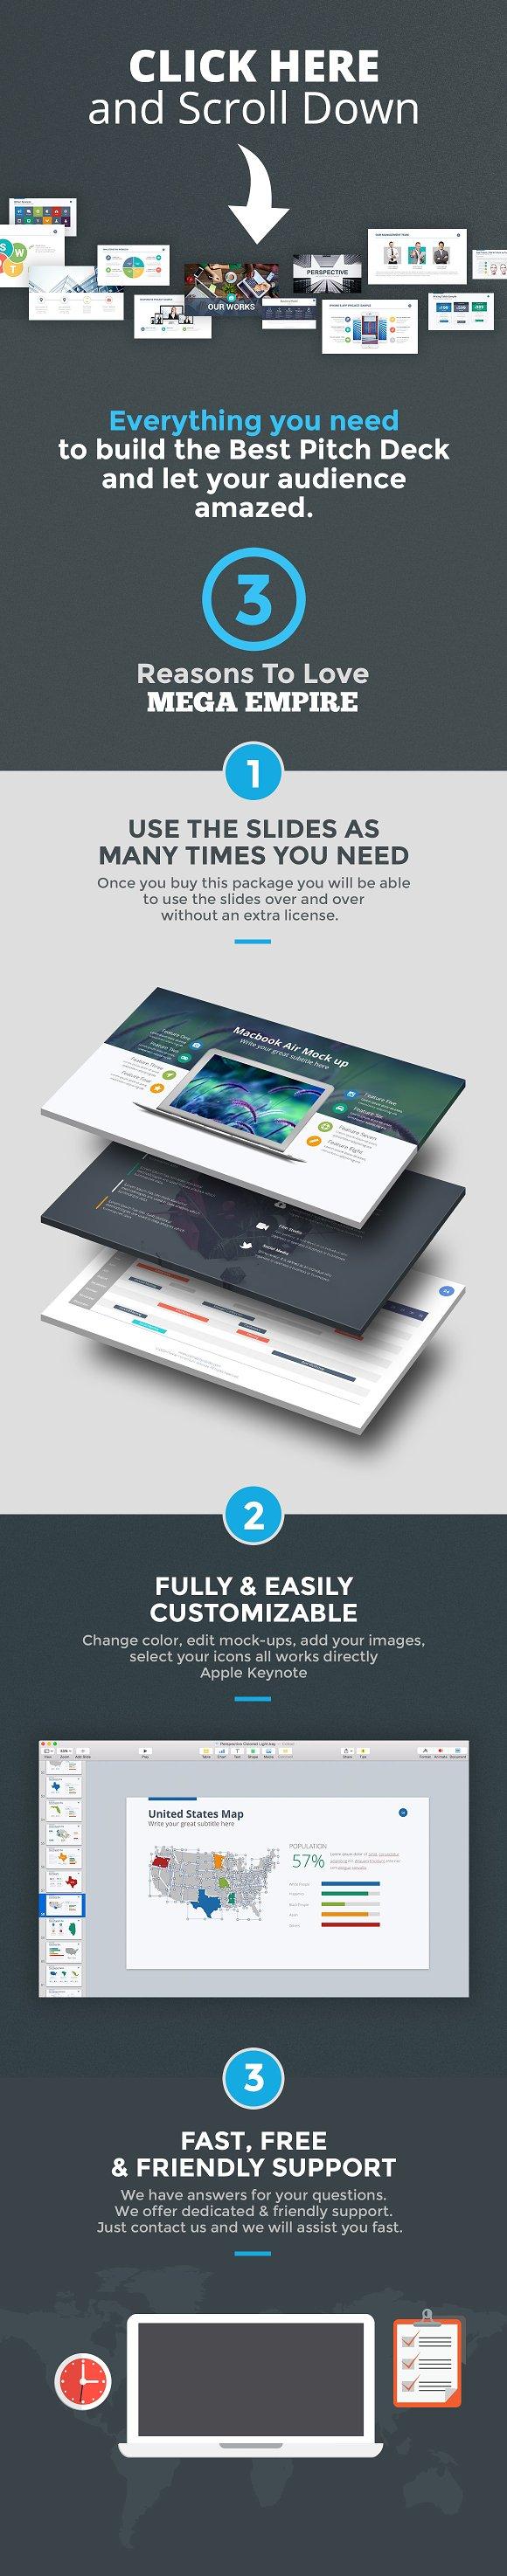 MEGA EMPIRE Keynote Bundle Presentation Templates Creative Market - Us map keynote